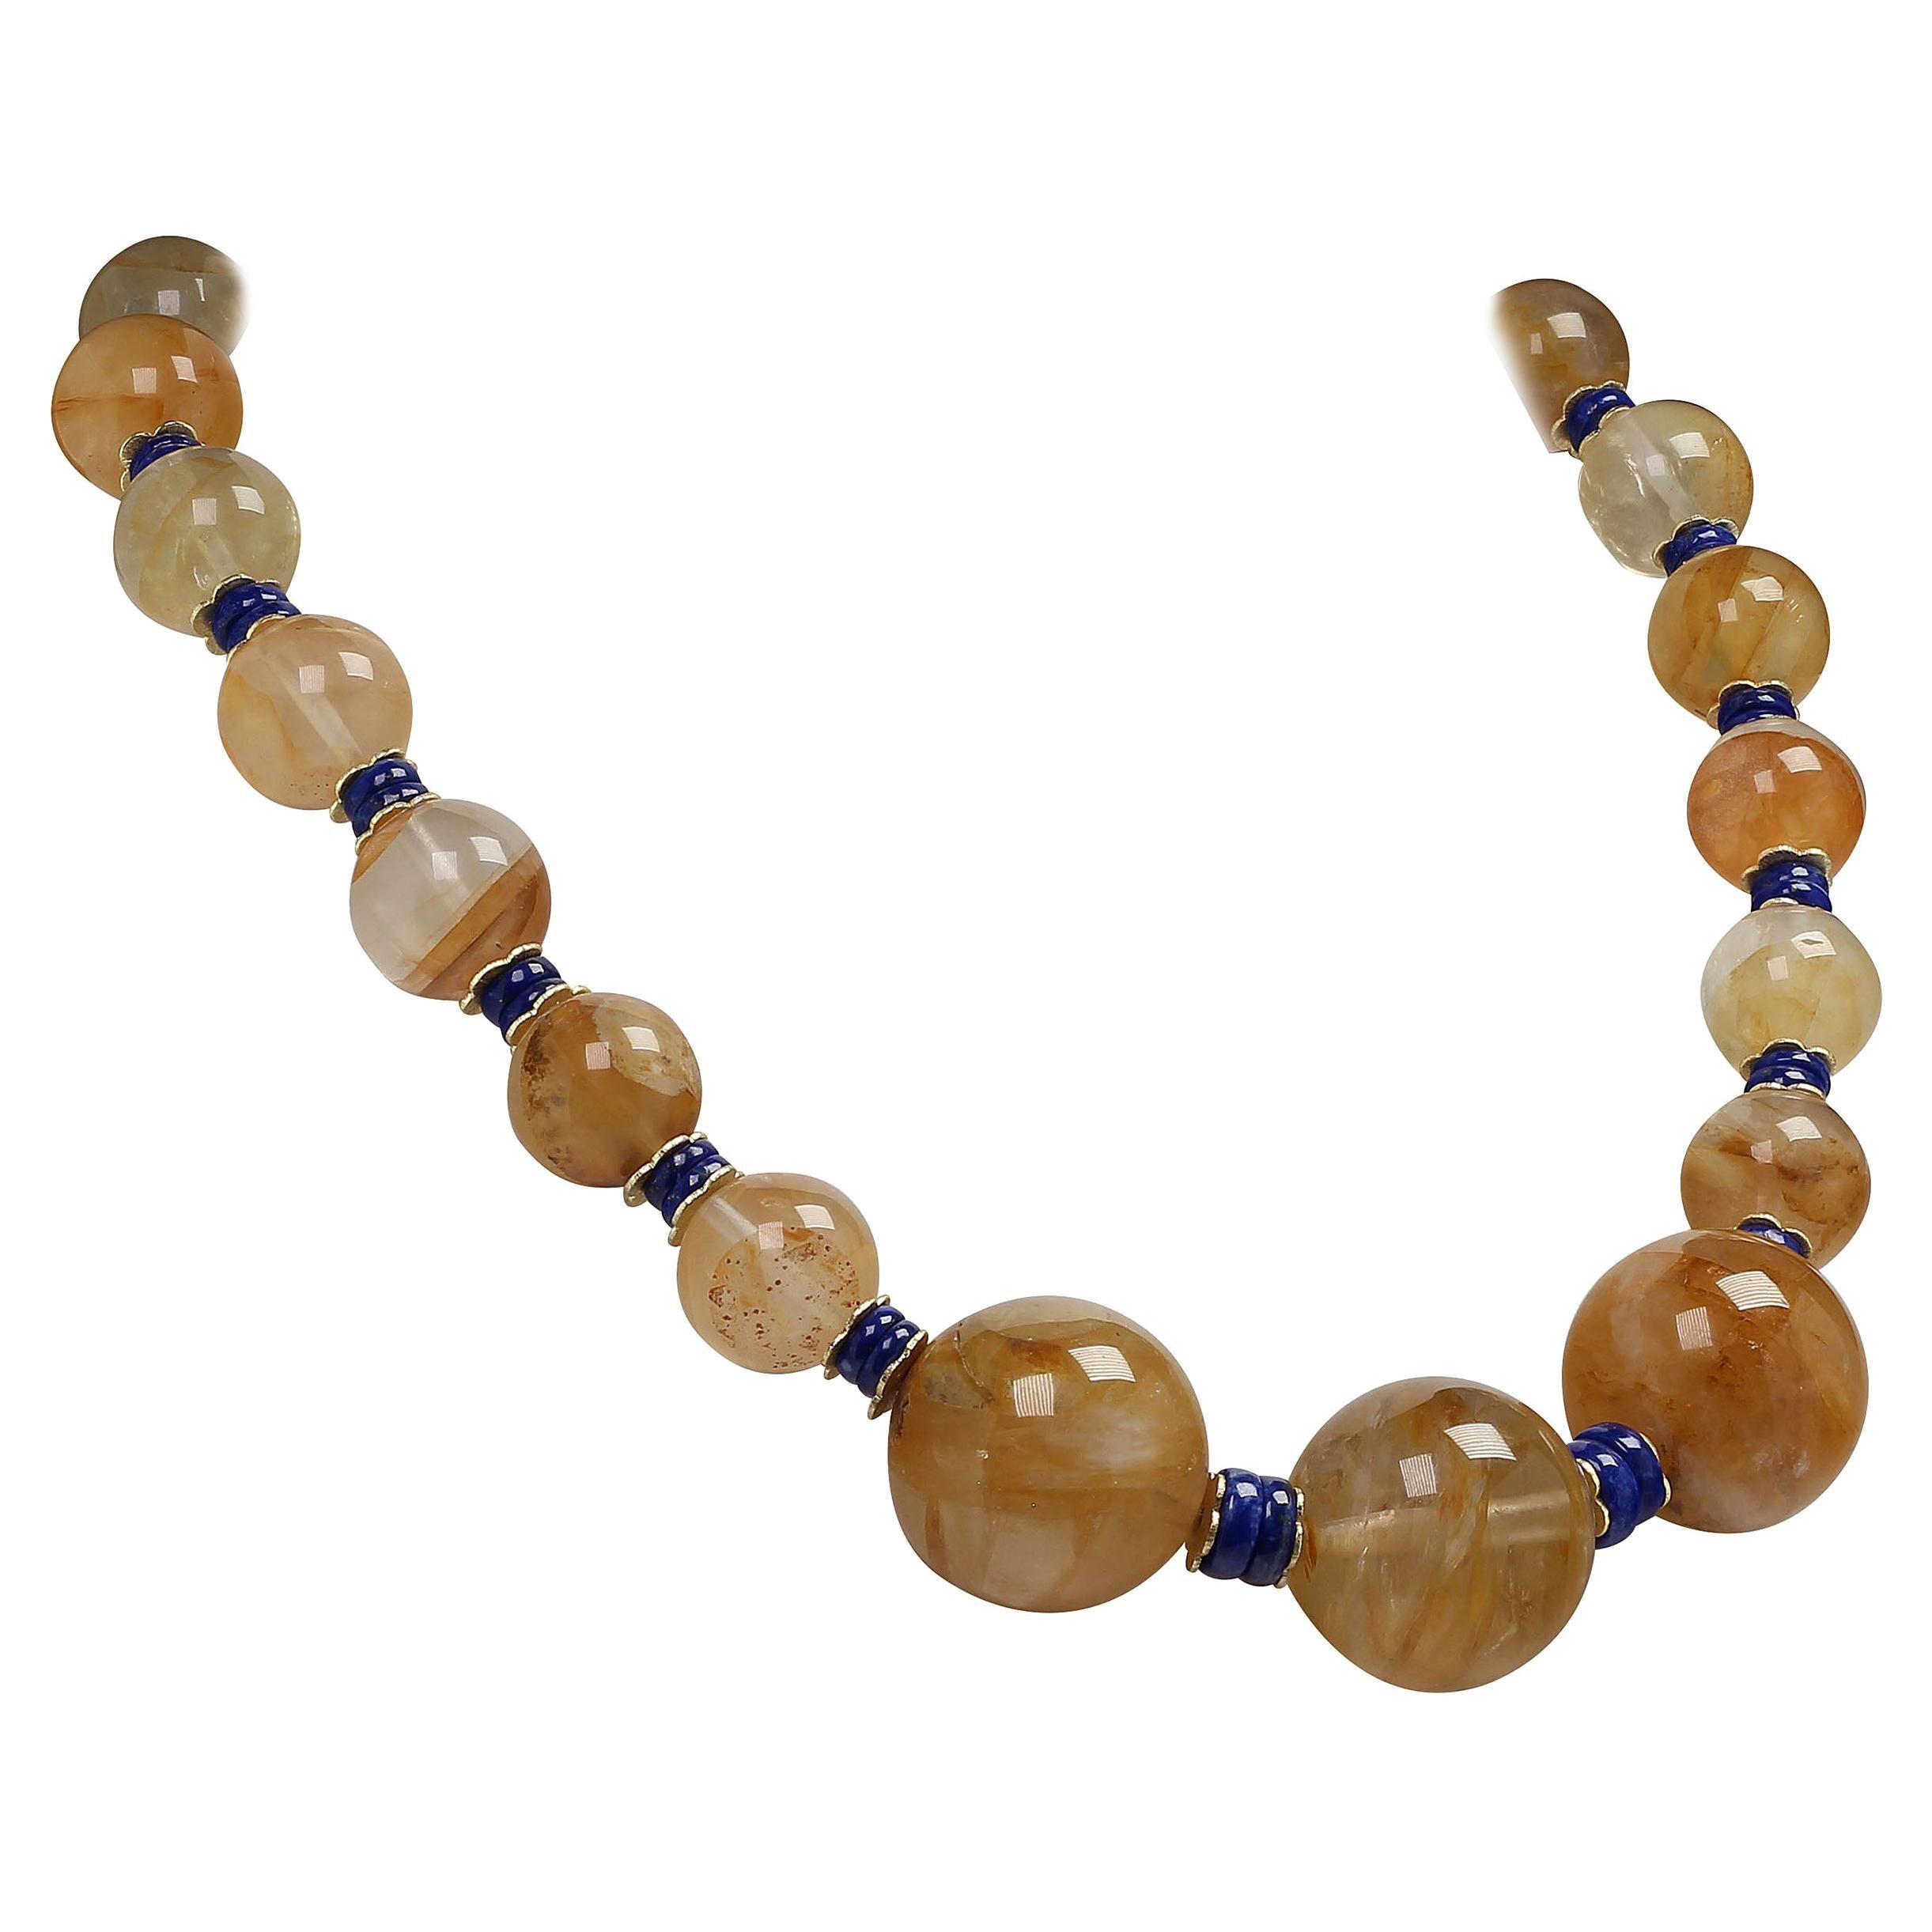 Golden Quartz and Lapis Lazuli Necklace